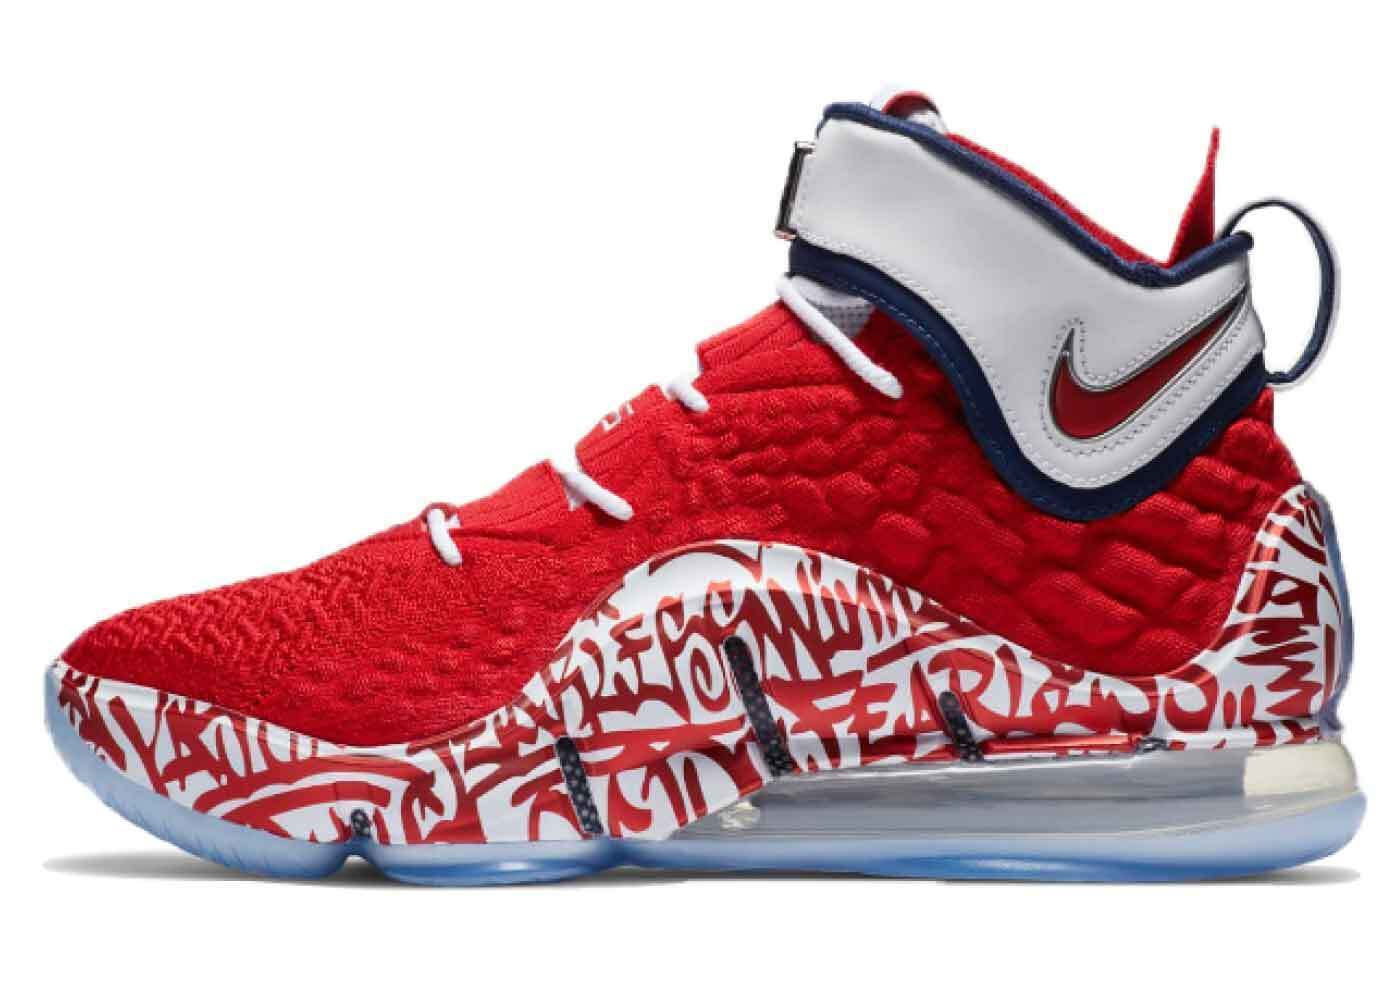 Nike LeBron 17 Graffiti Fire Redの写真